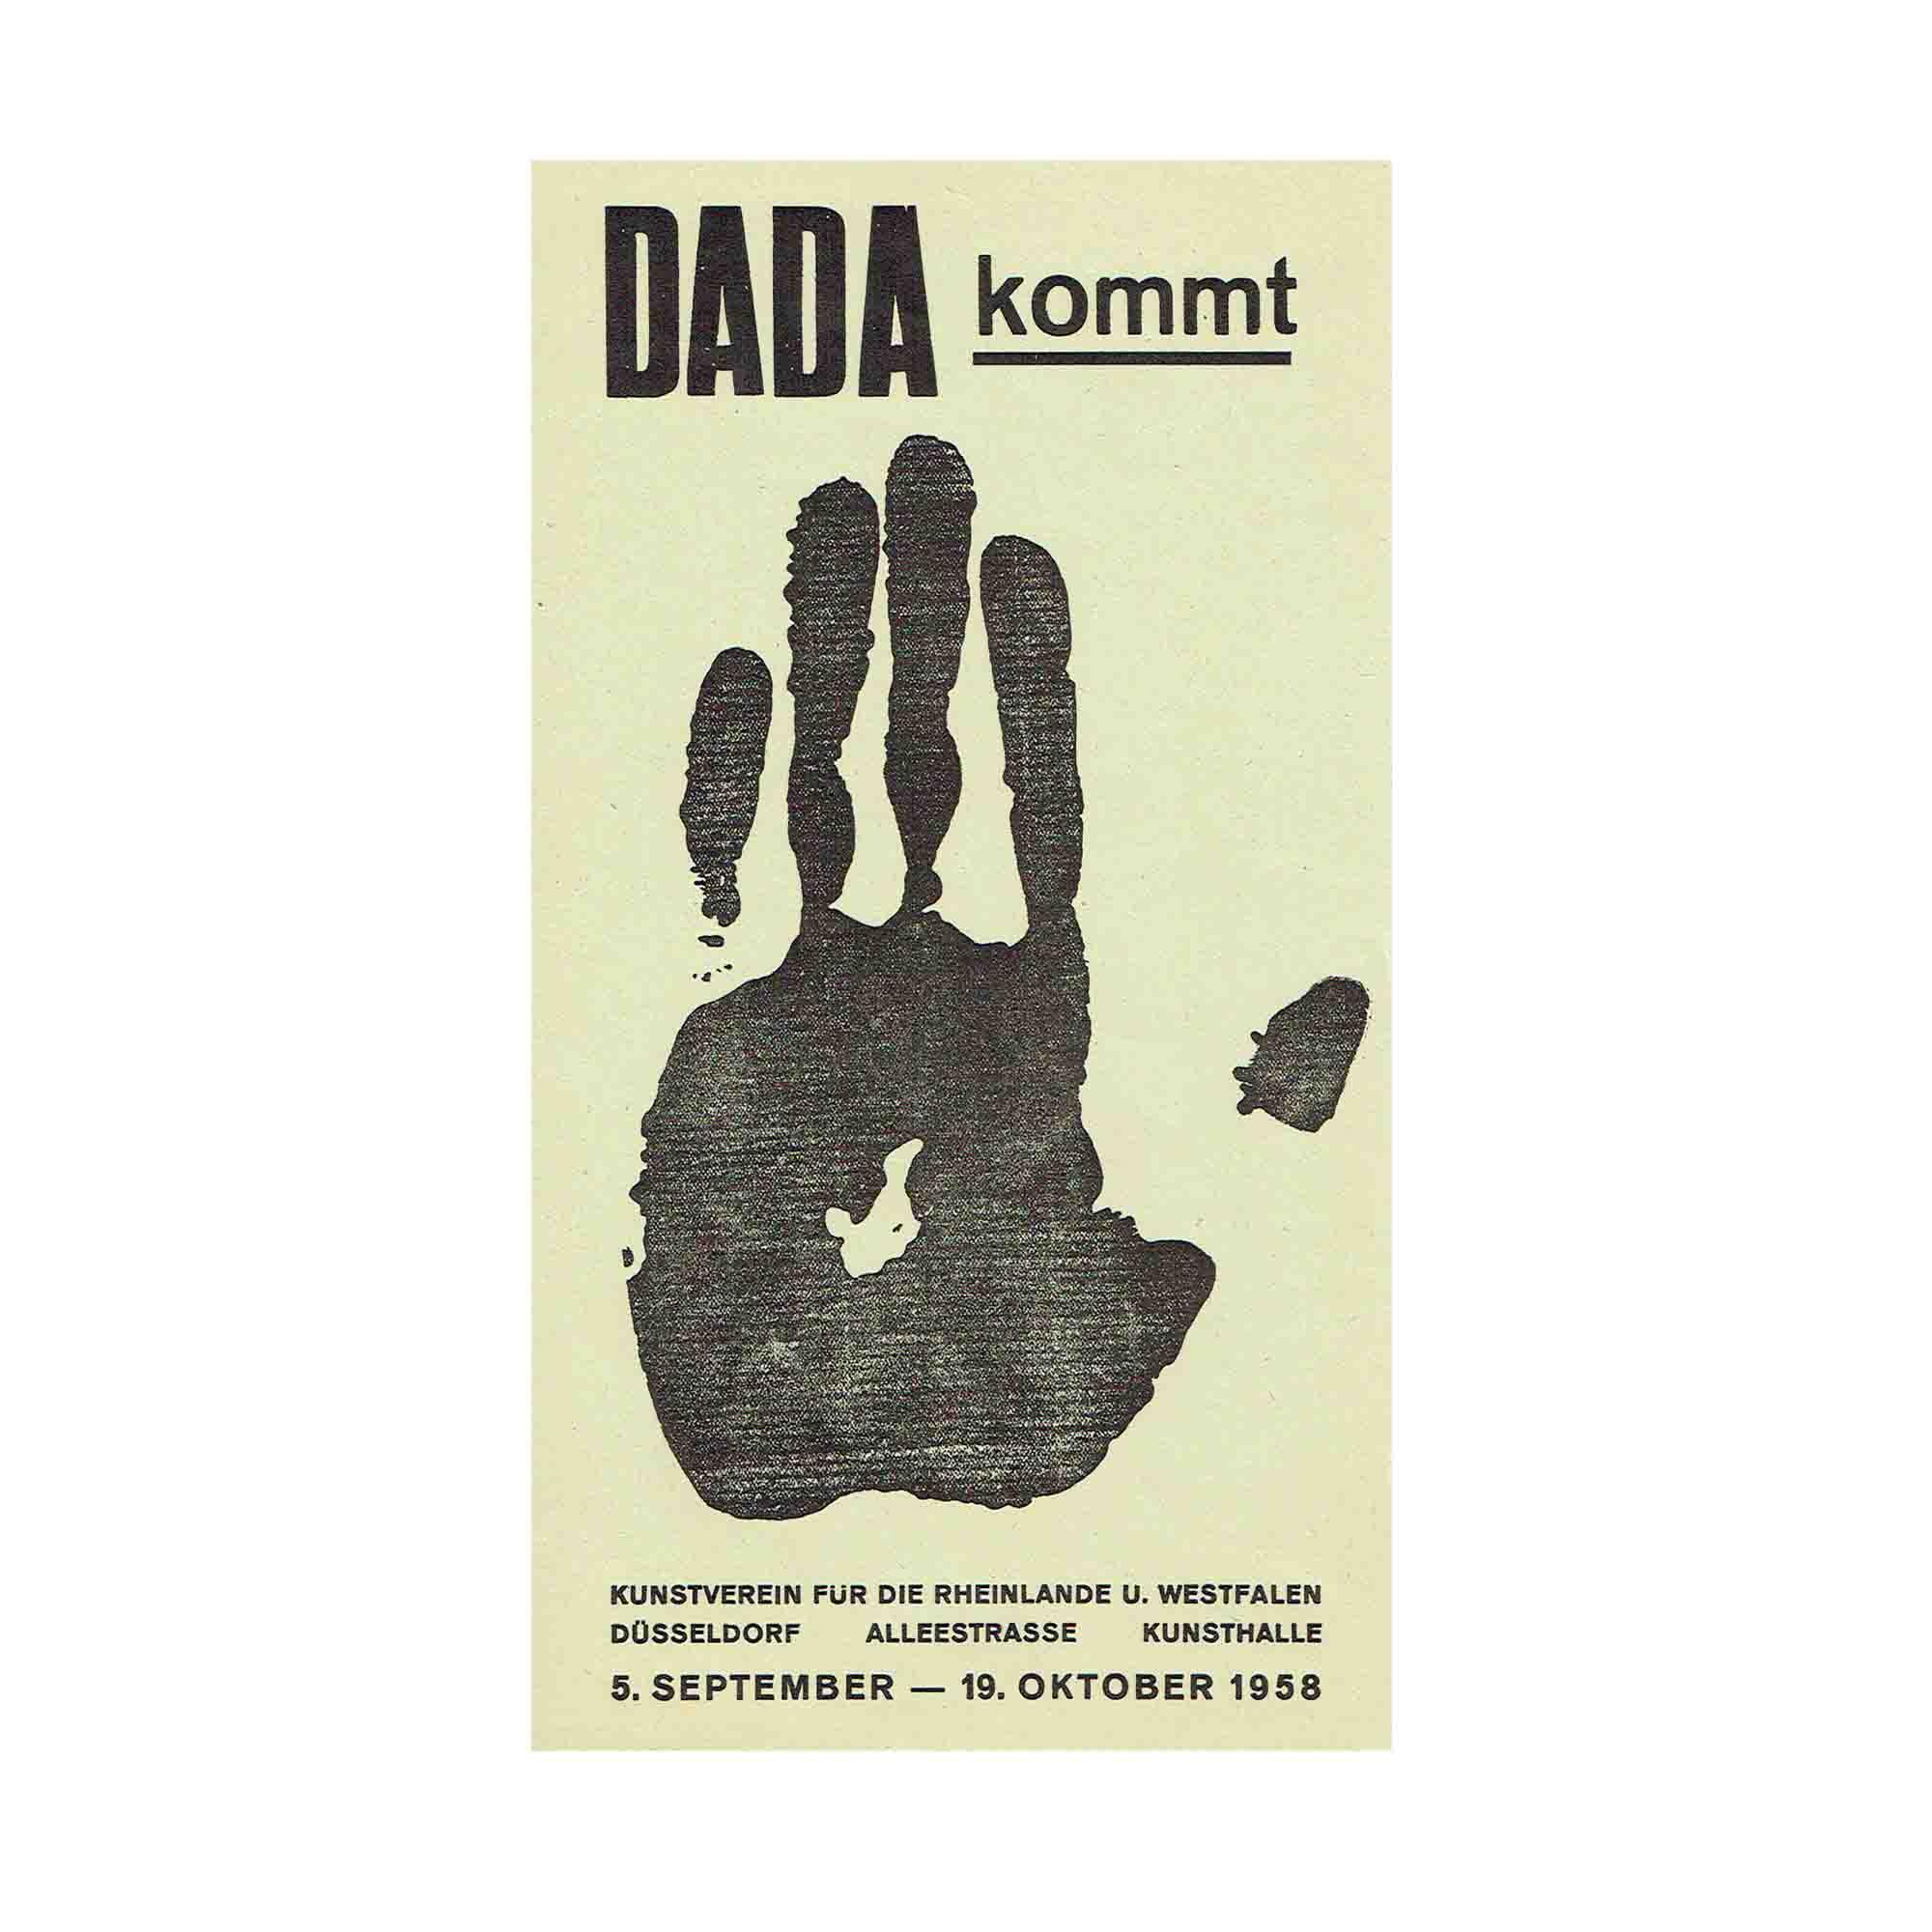 5188-Plakat-Ausstellung-Dada-kommt-1958-gelb-N.jpeg